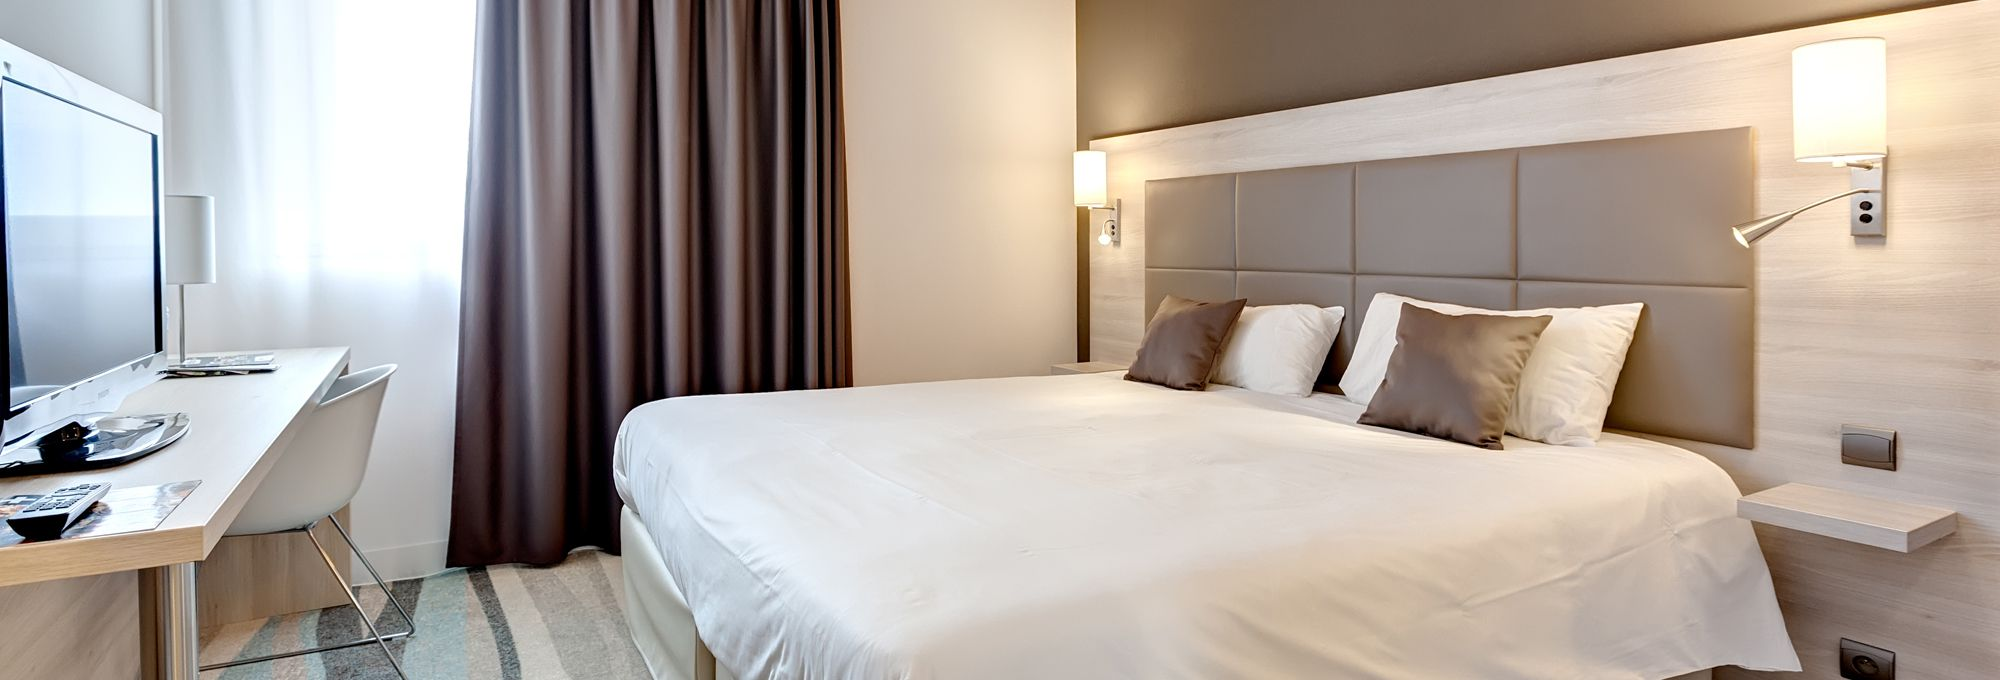 Brit Hotel Vendée Mer - La Mothe Achard